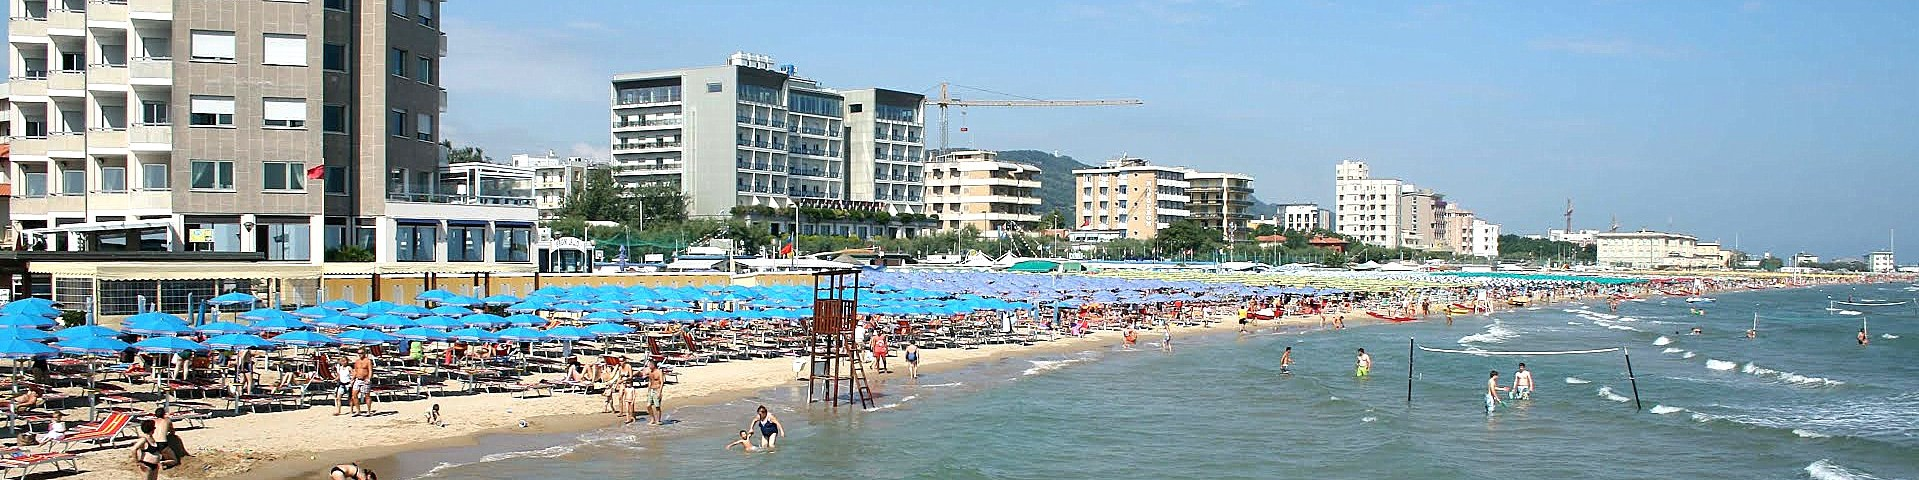 Pesaro, pláž v centru